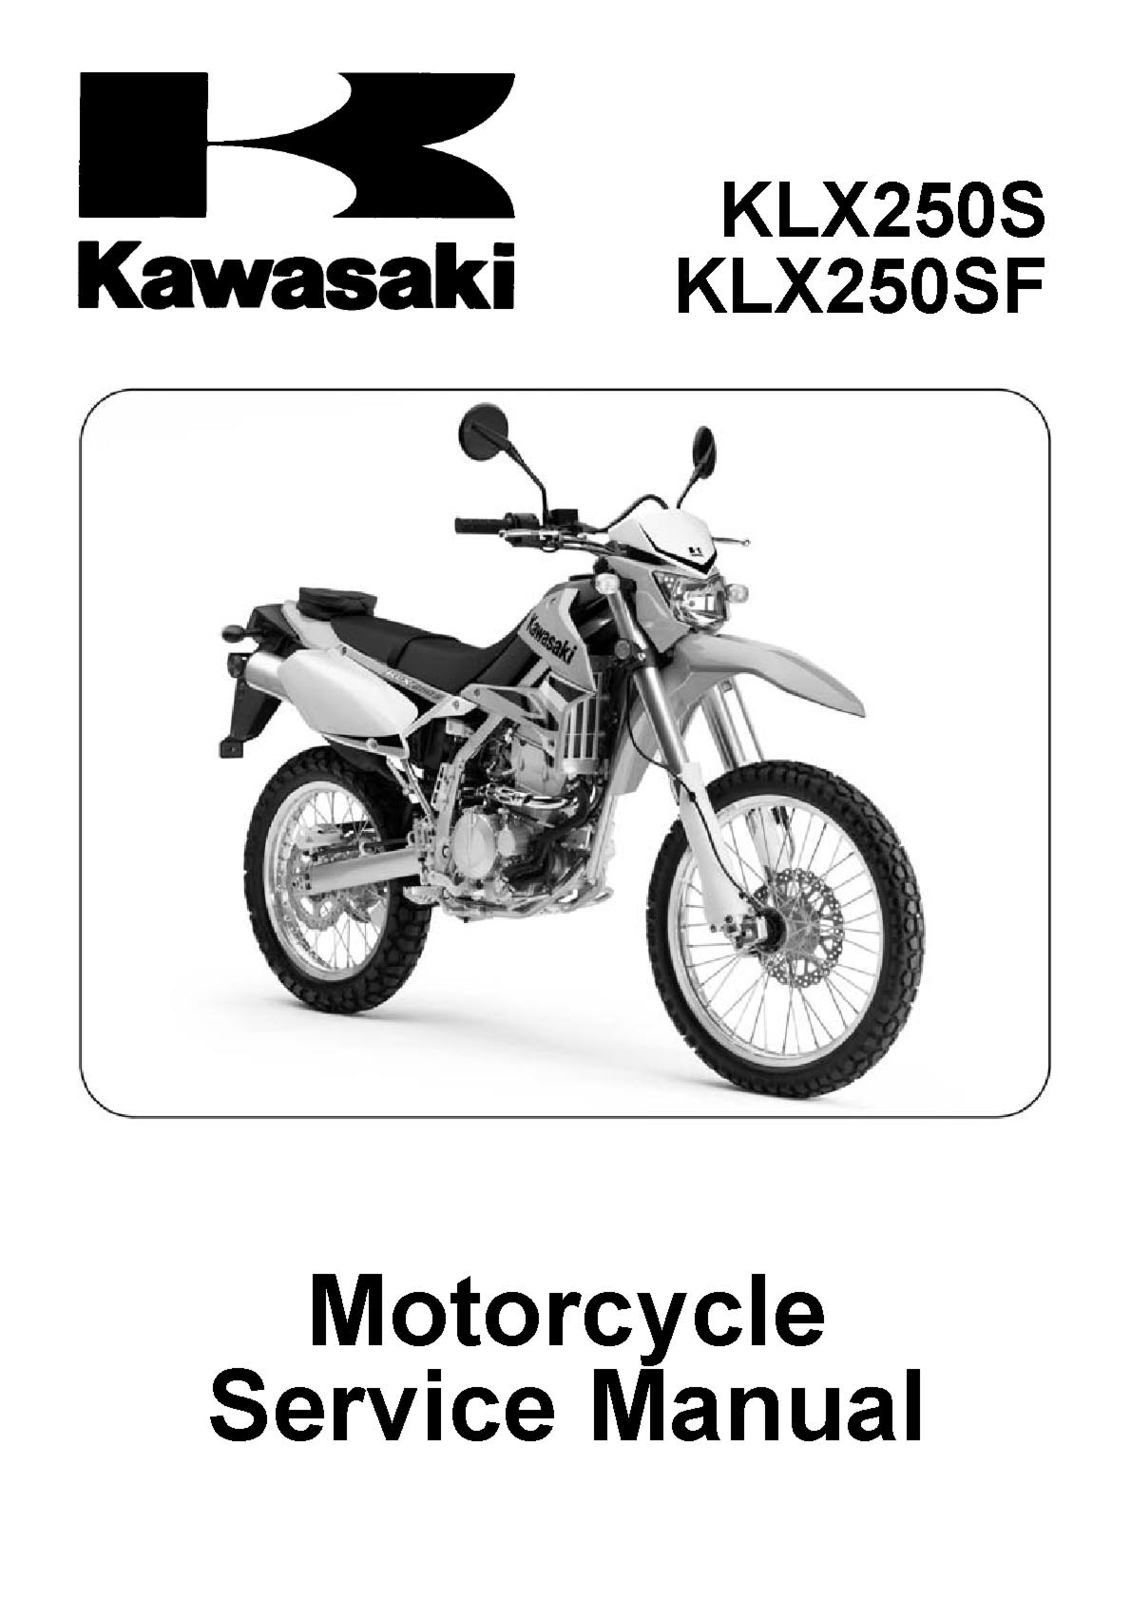 kawasaki klx250s klx250sf klx 250 s sf 250s and 44 similar items rh bonanza  com 2016 Kawasaki KLX 250 2004 kawasaki klr 250 service manual